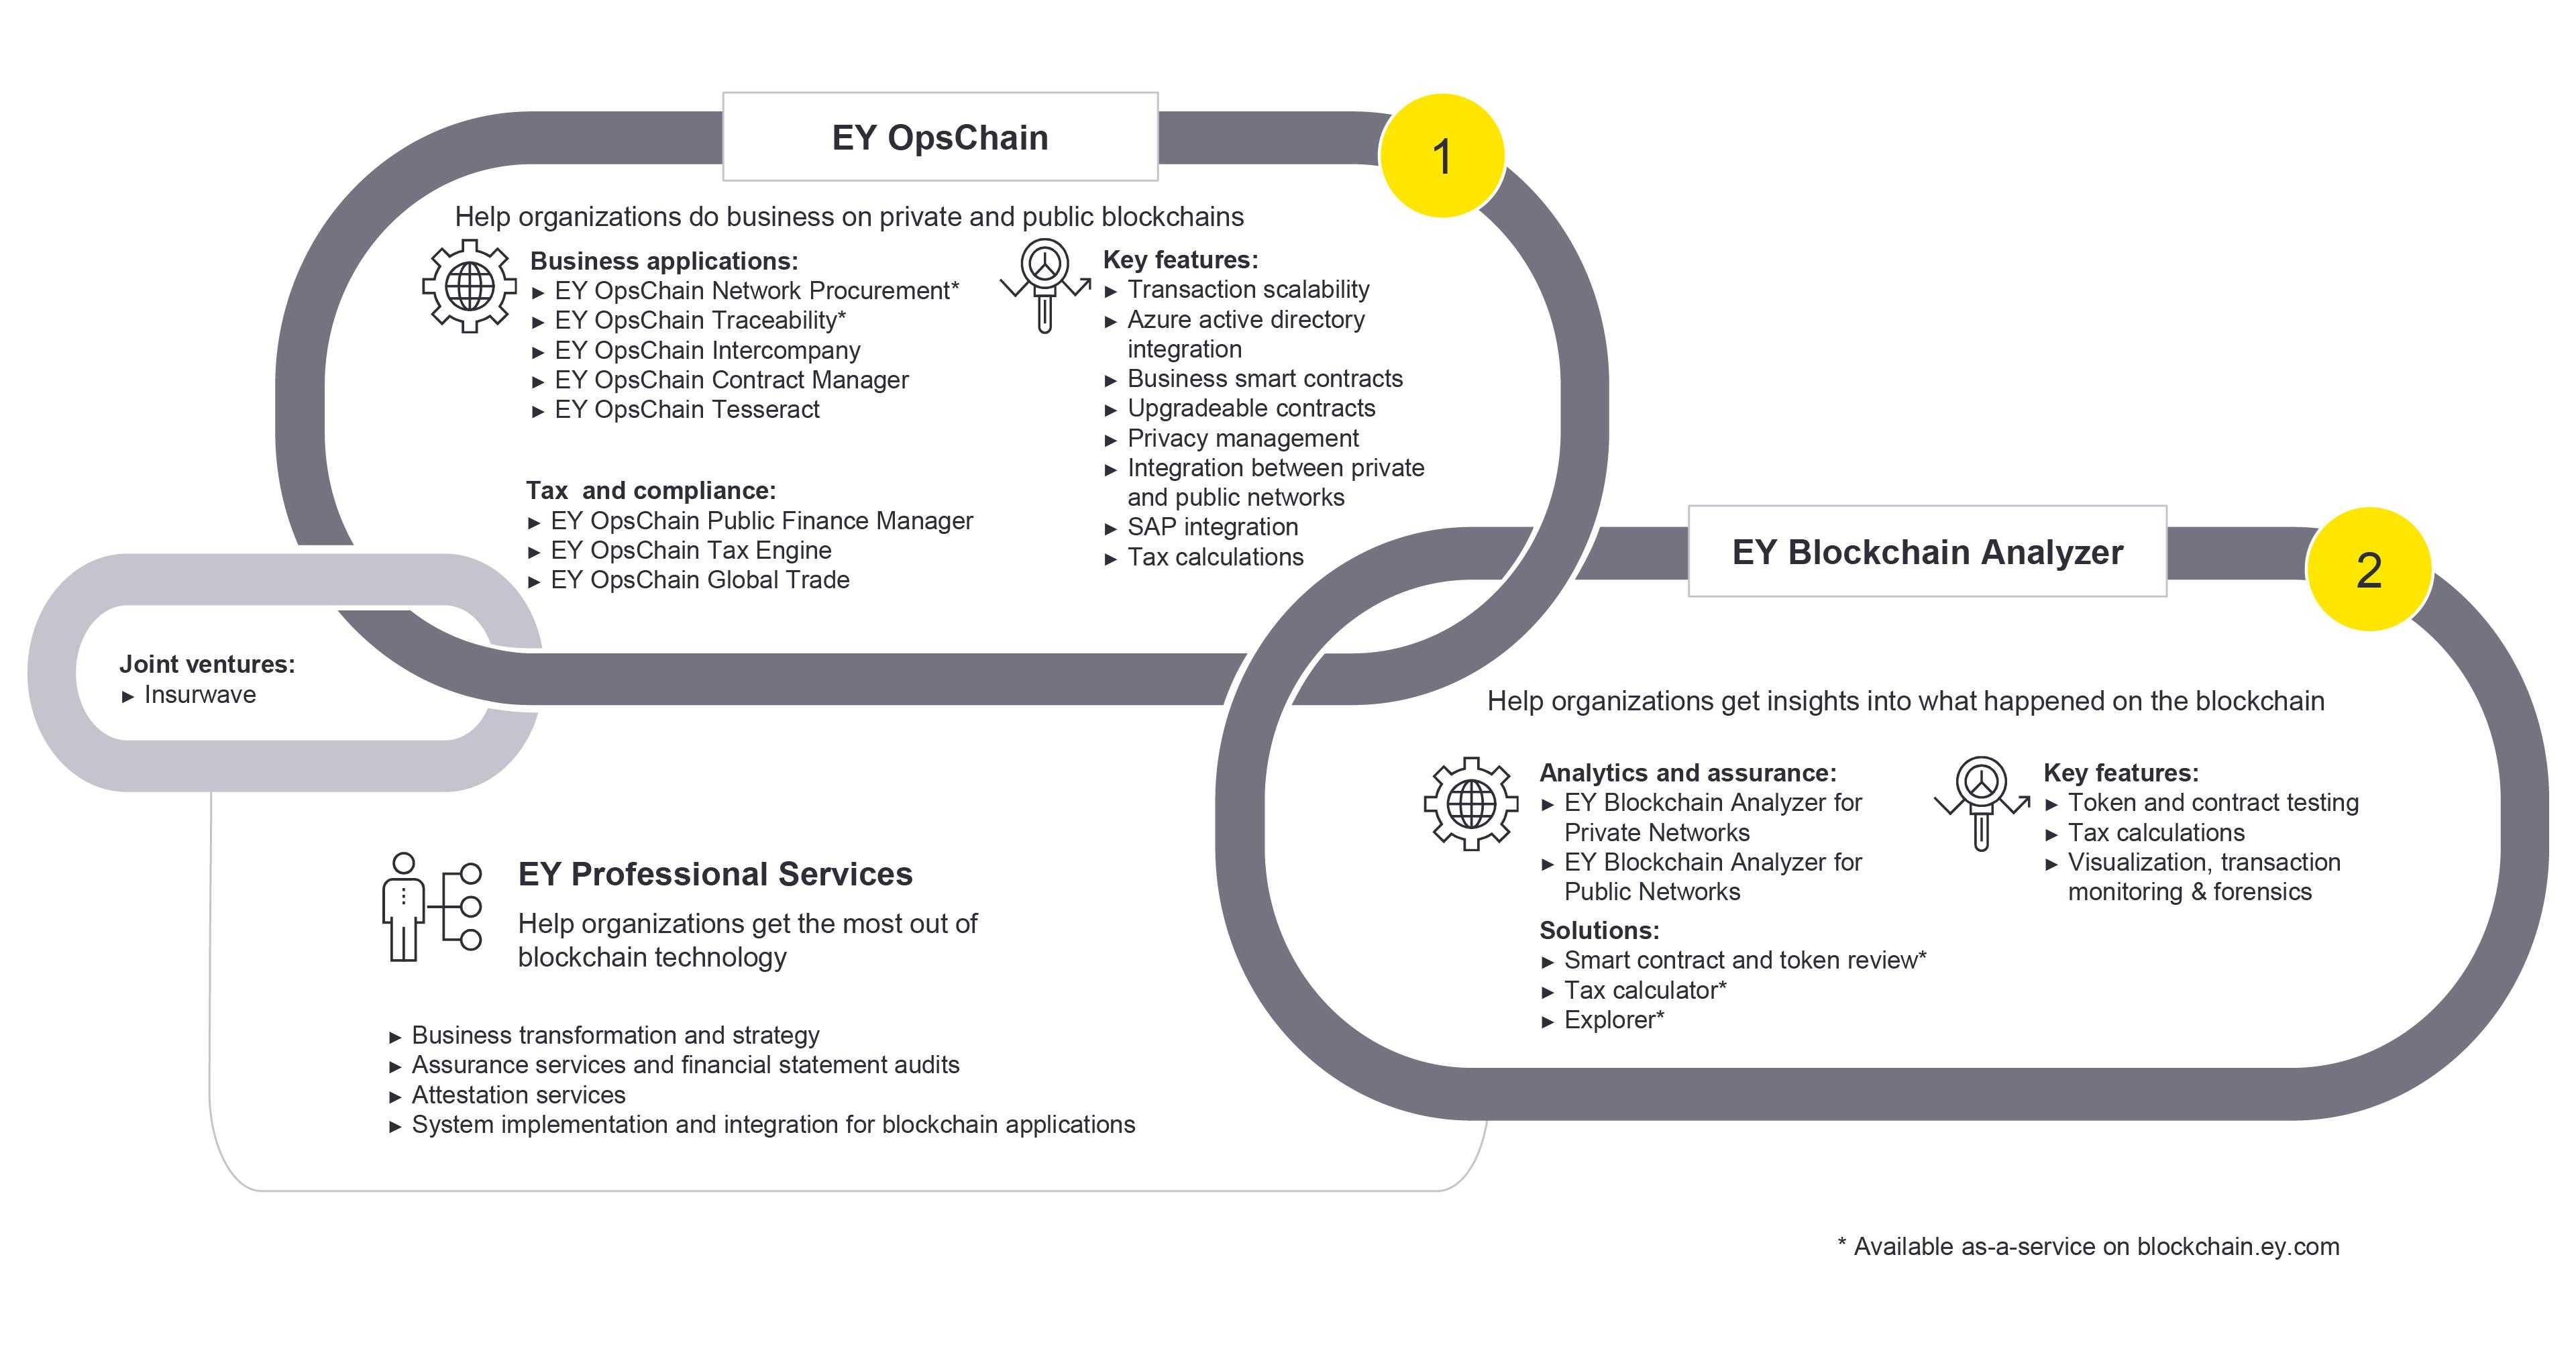 Infographic depicting EY's blockchain platforms